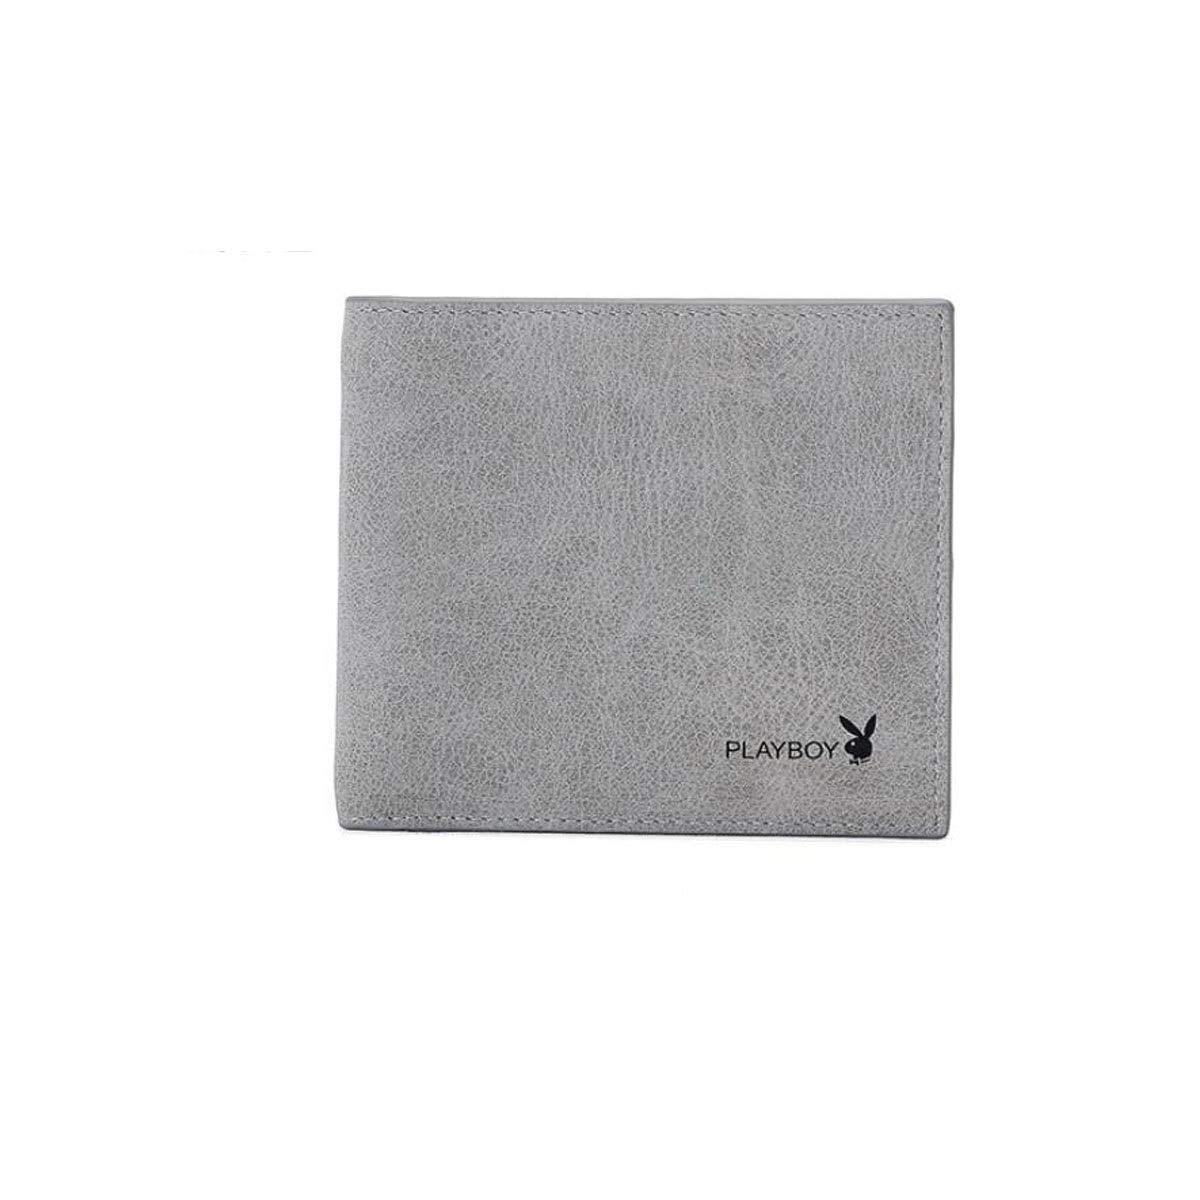 11 1.5 9.5 Kalmar RFID Travel Wallet cm Stealth Mode Blocking Leather Wallet Suitable for Men Morden New Short Student Youth Morden Personality Leather Wallet Color Black Size